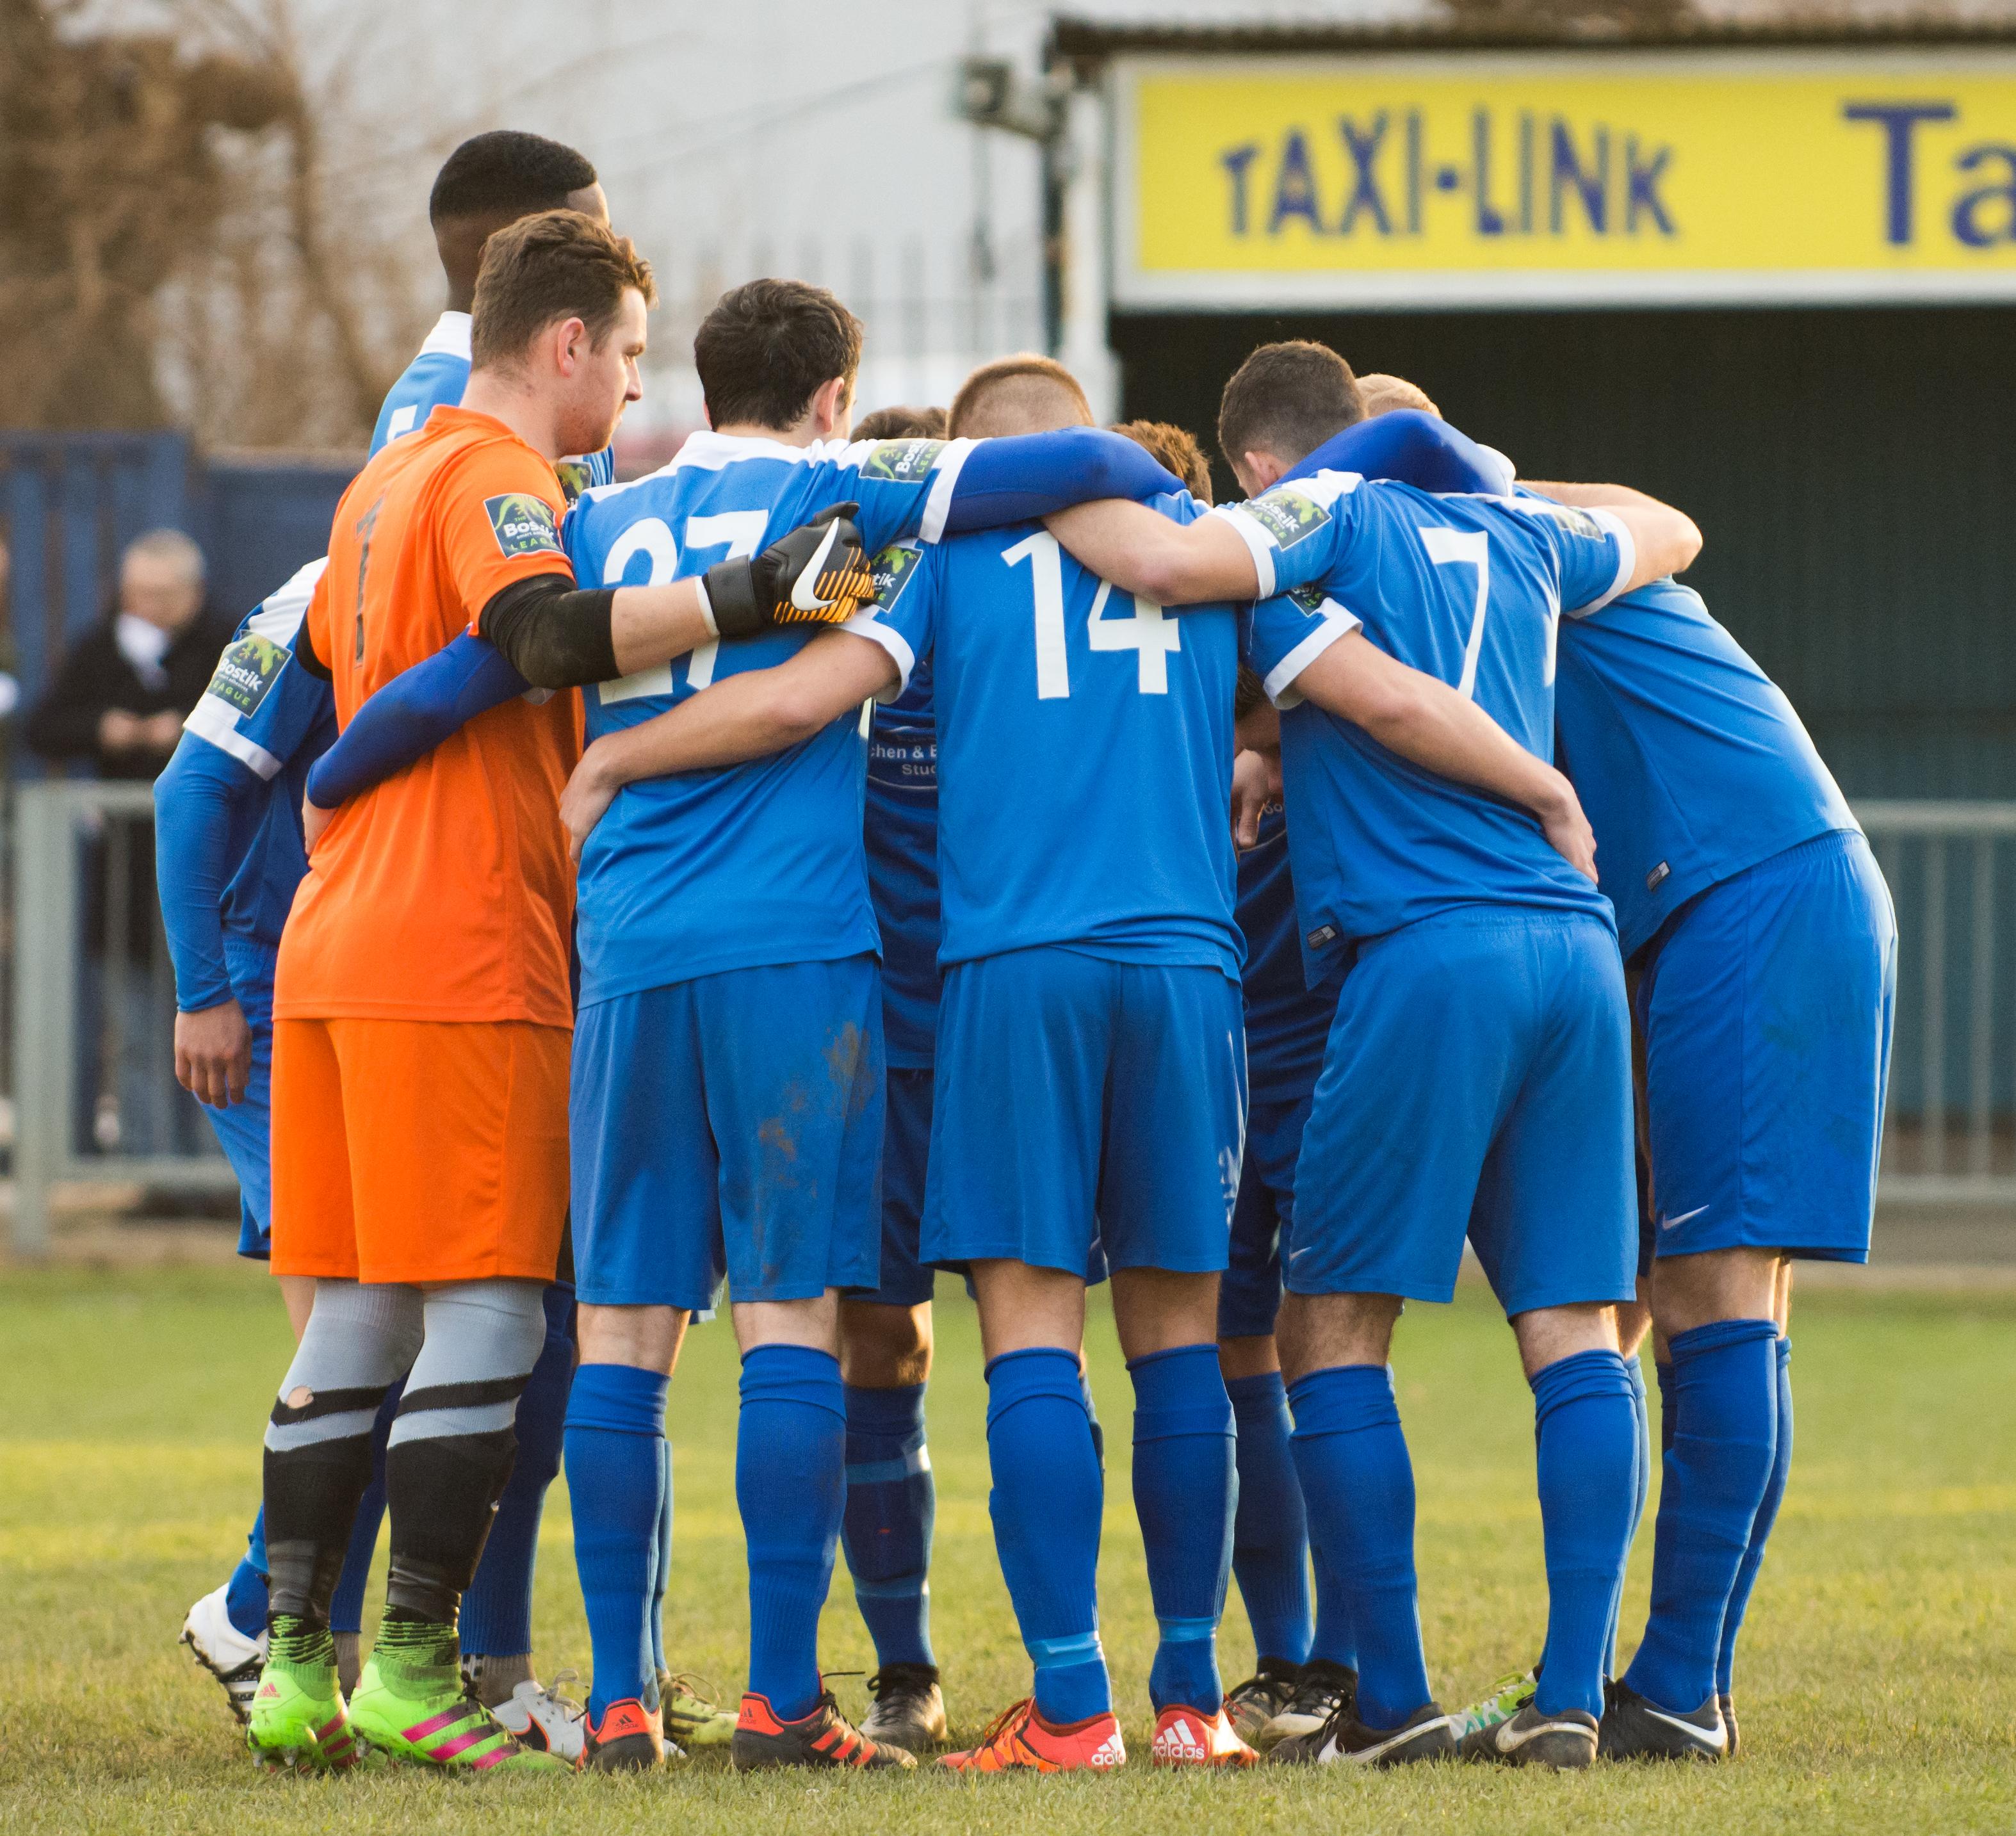 Shoreham FC vs Molesey FC 02.12.17 37